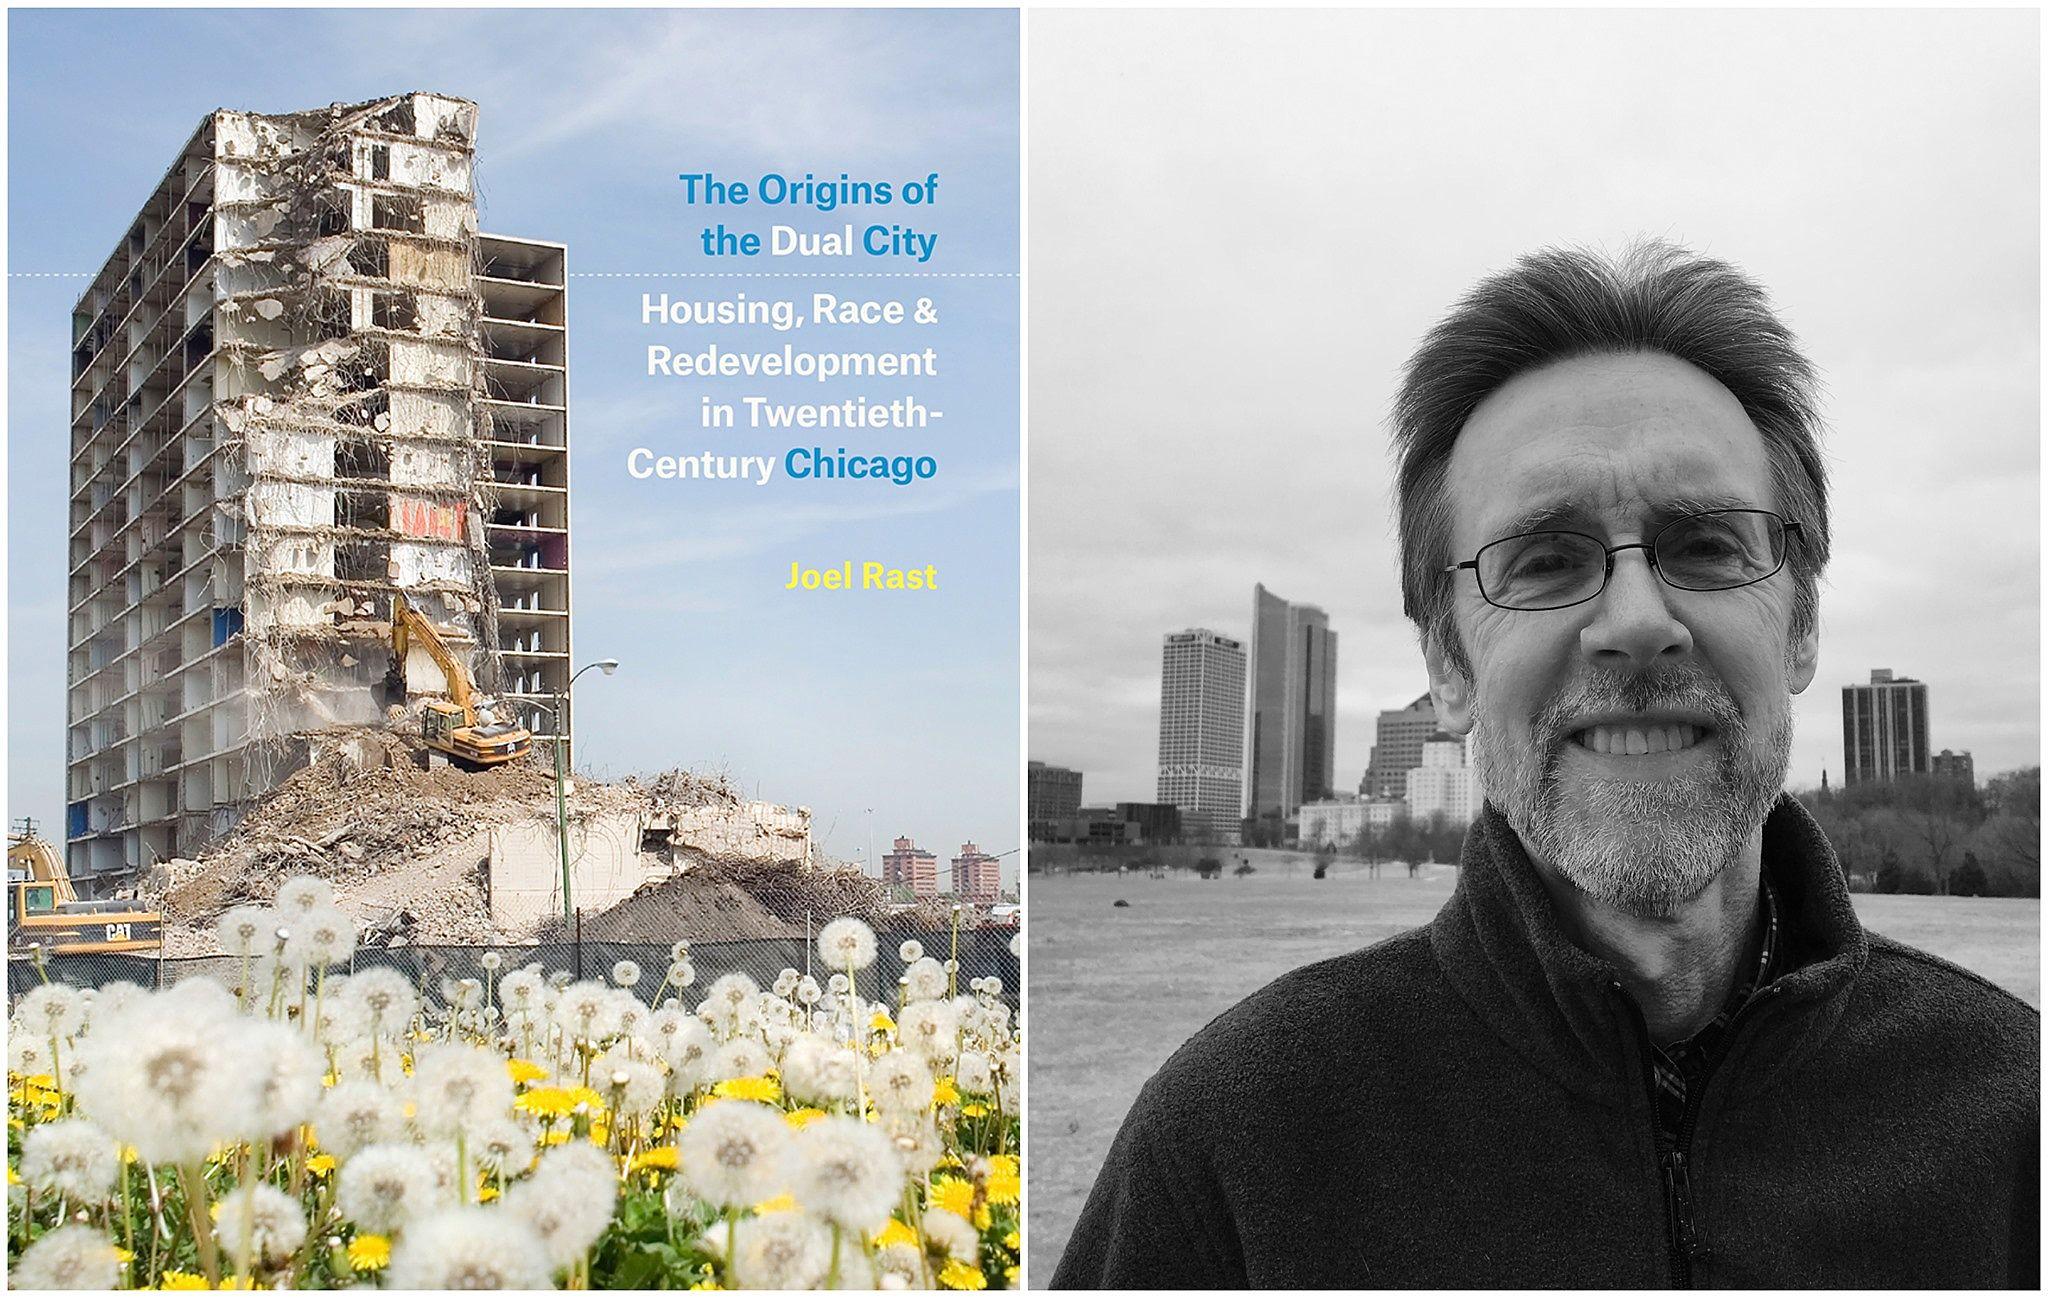 Joel Rast - The Origins of the Dual City